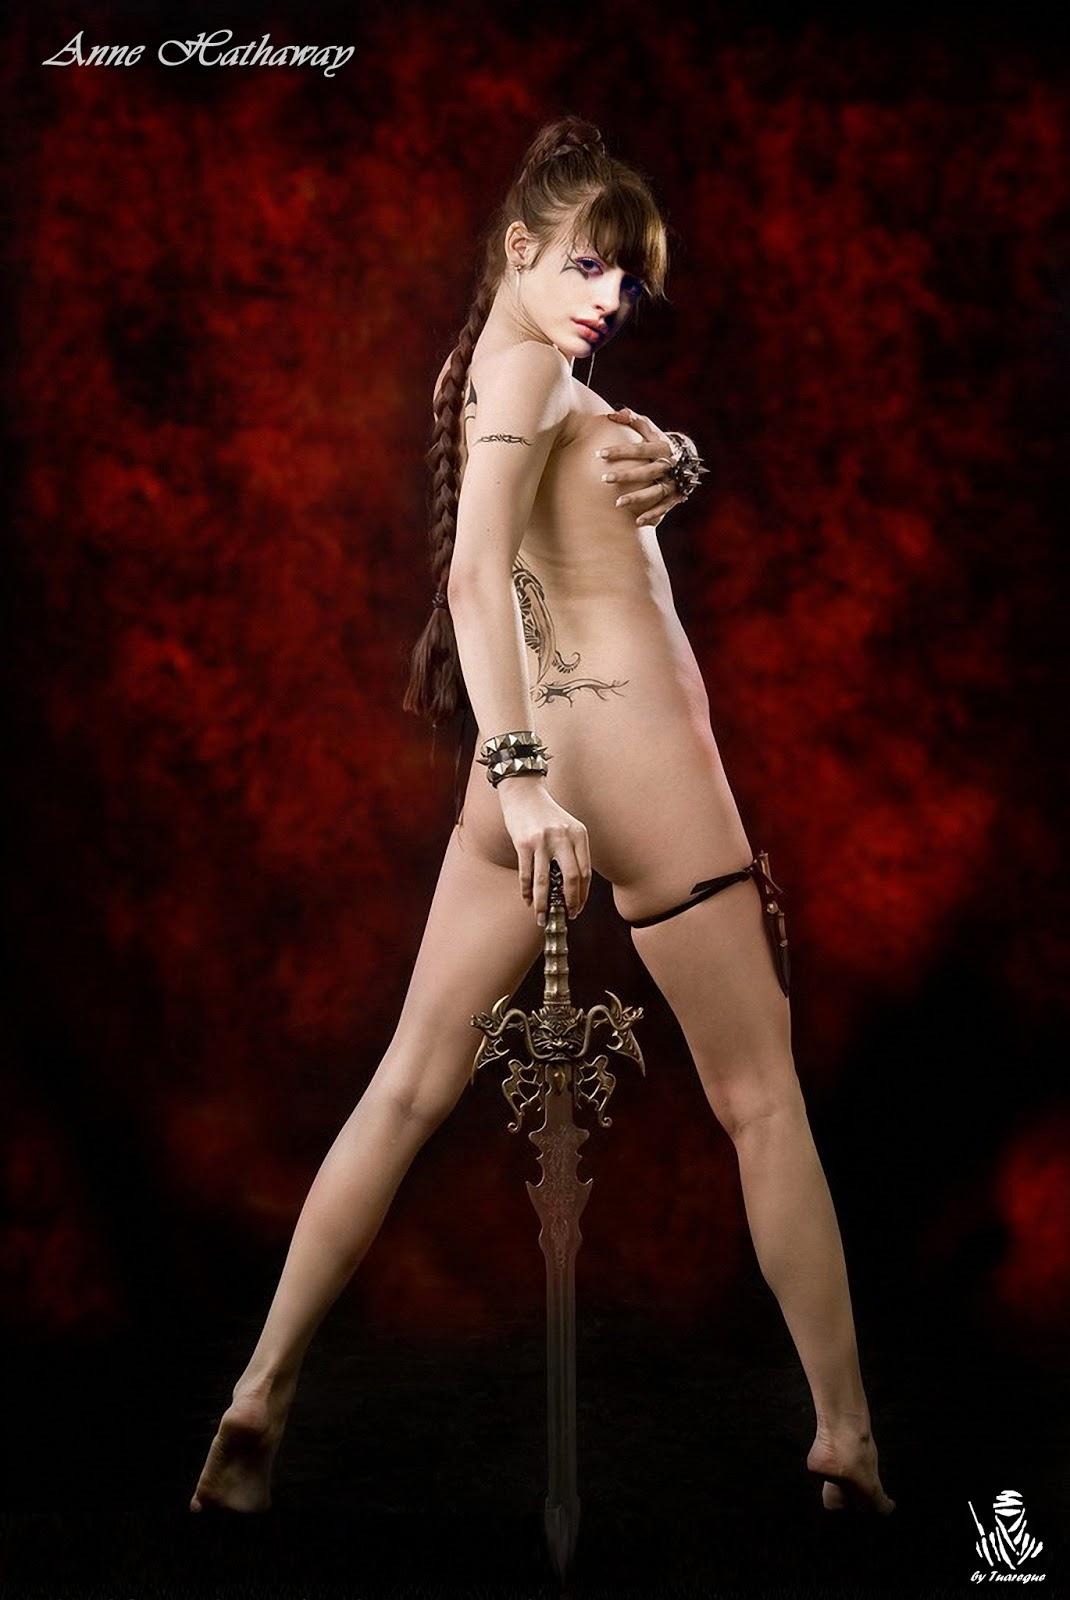 afganistan girls naked body pics